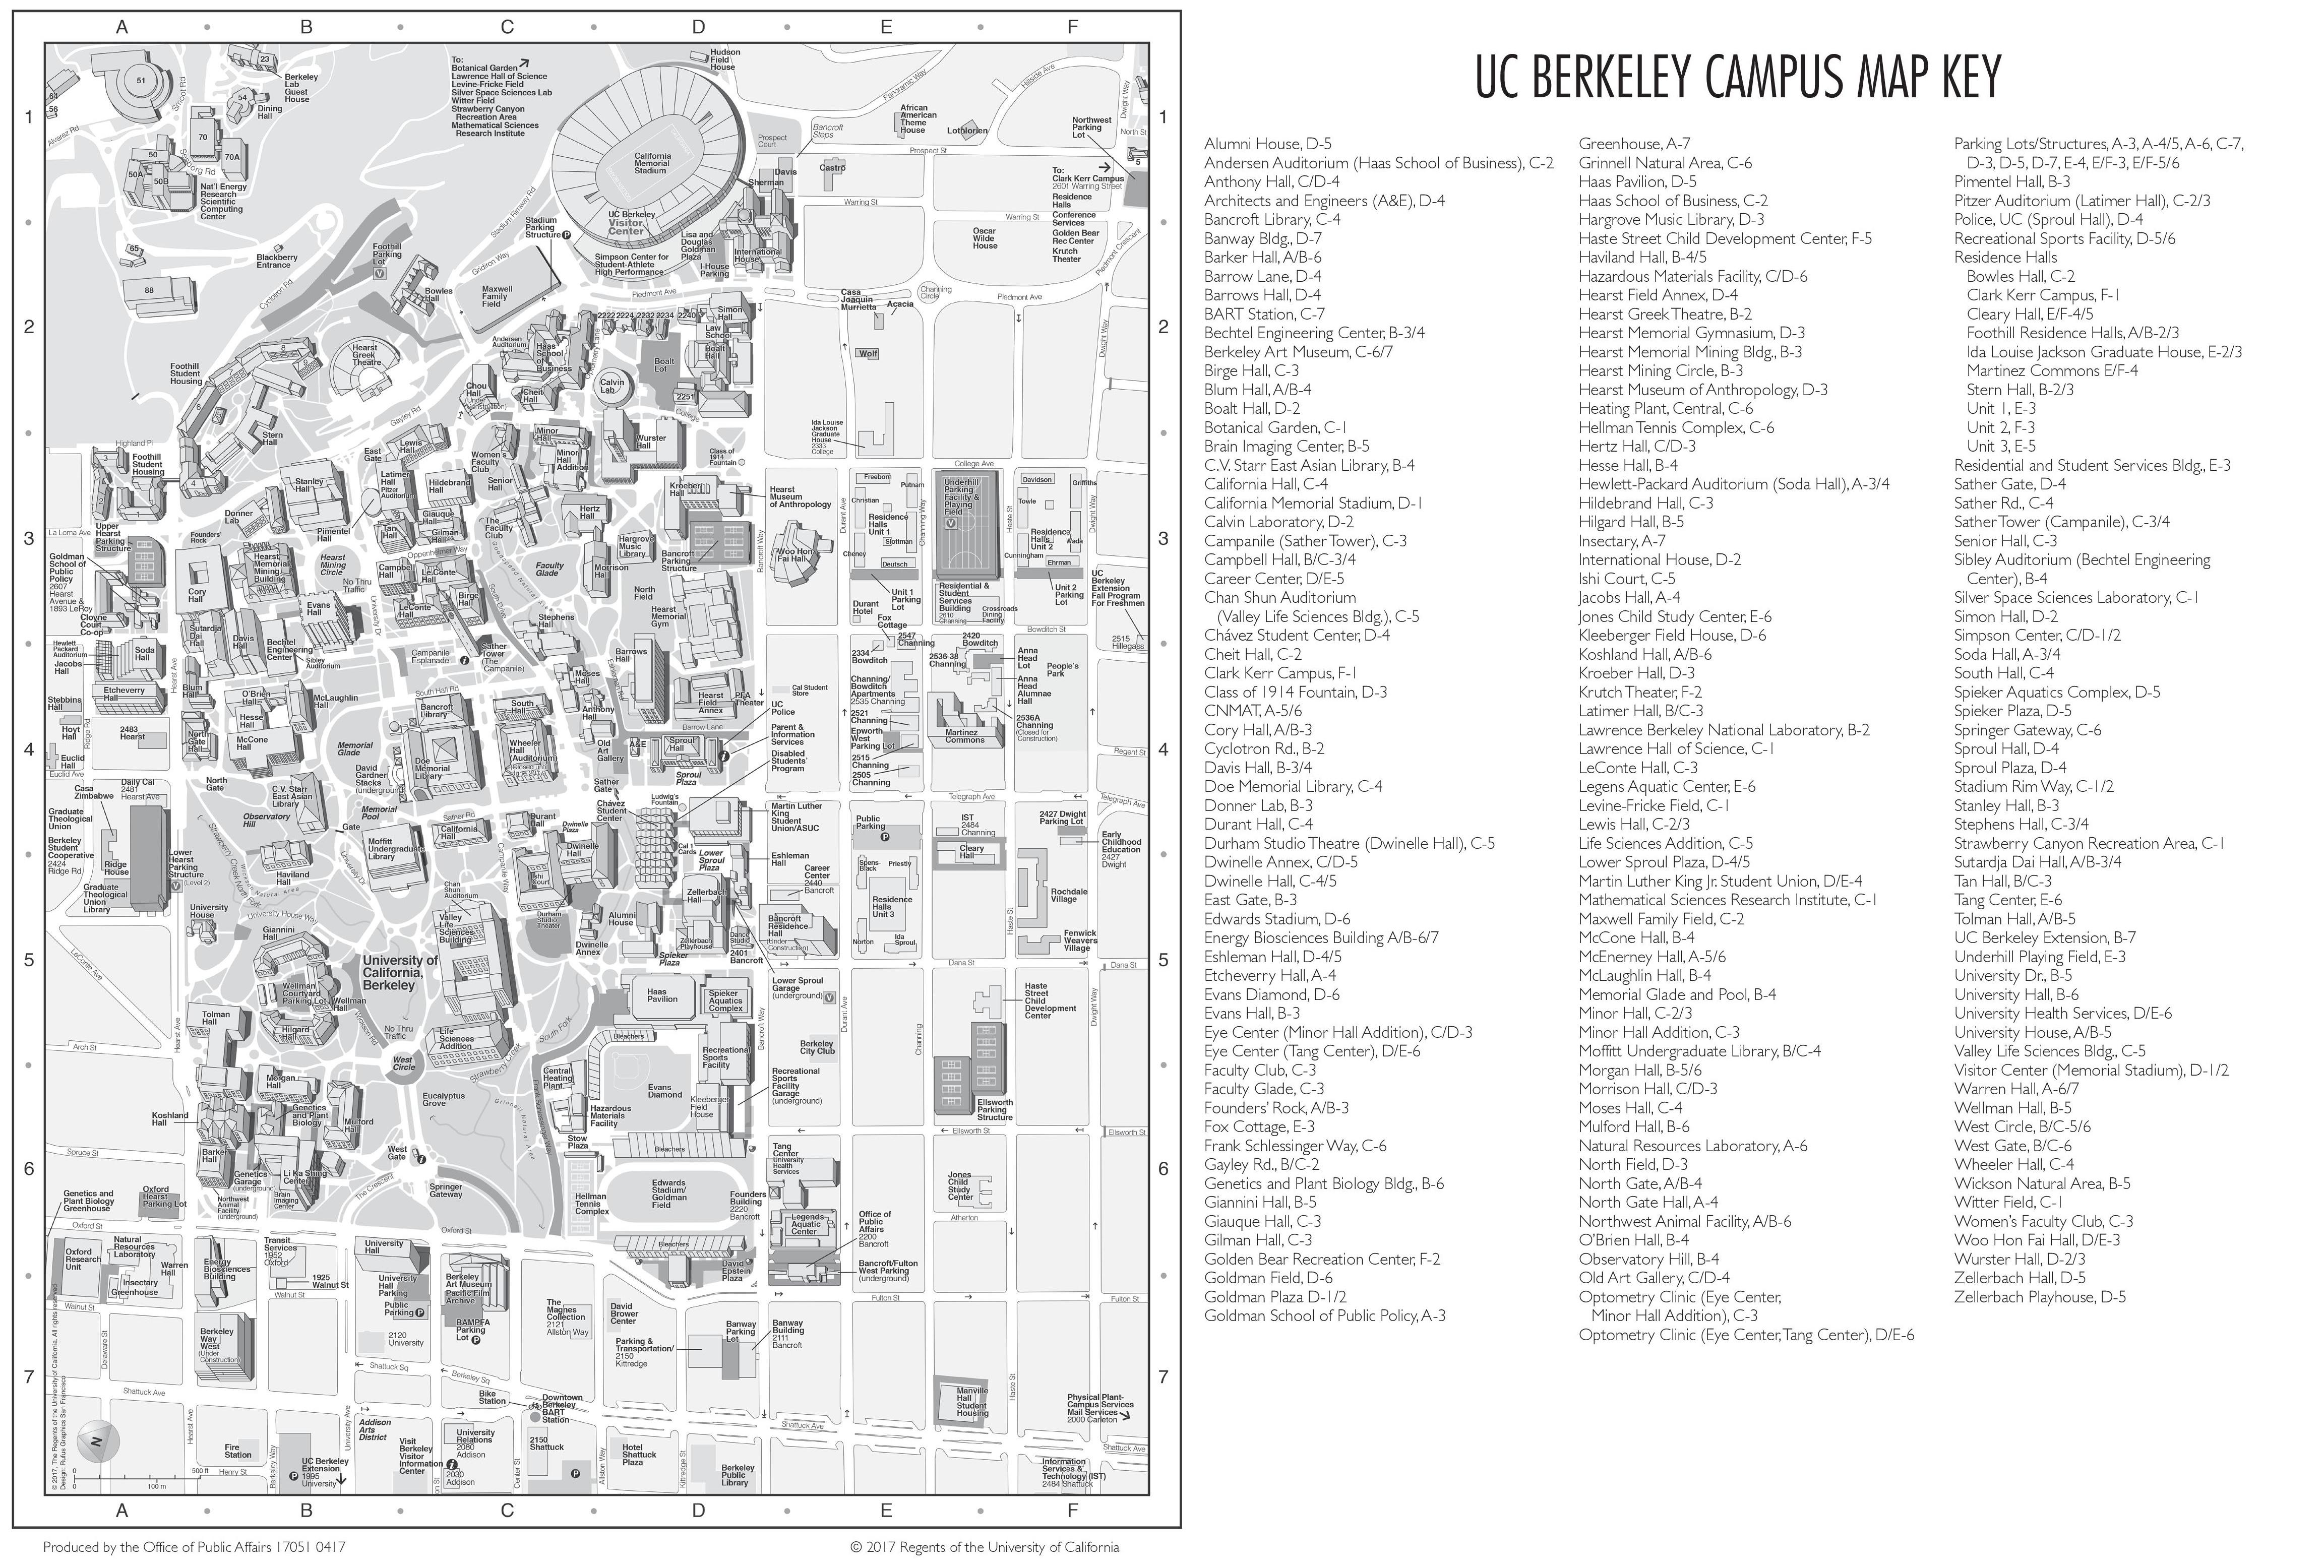 uc berkely campus map Berkeley Campus Map uc berkely campus map